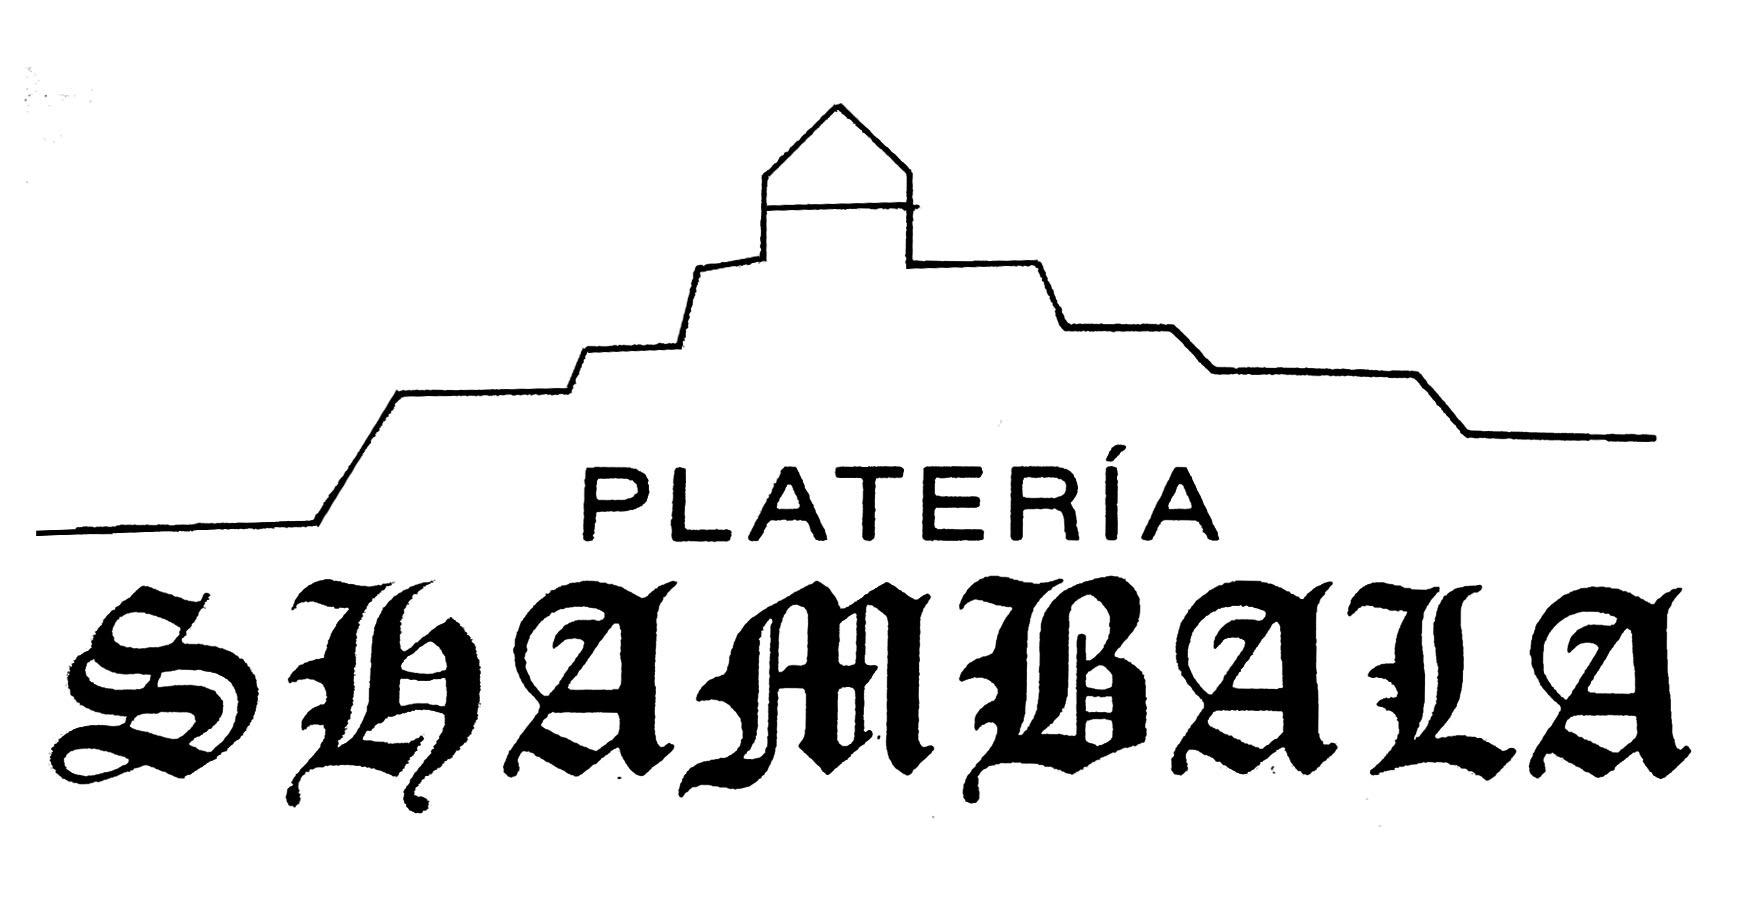 PLATERIA SHAMBALA